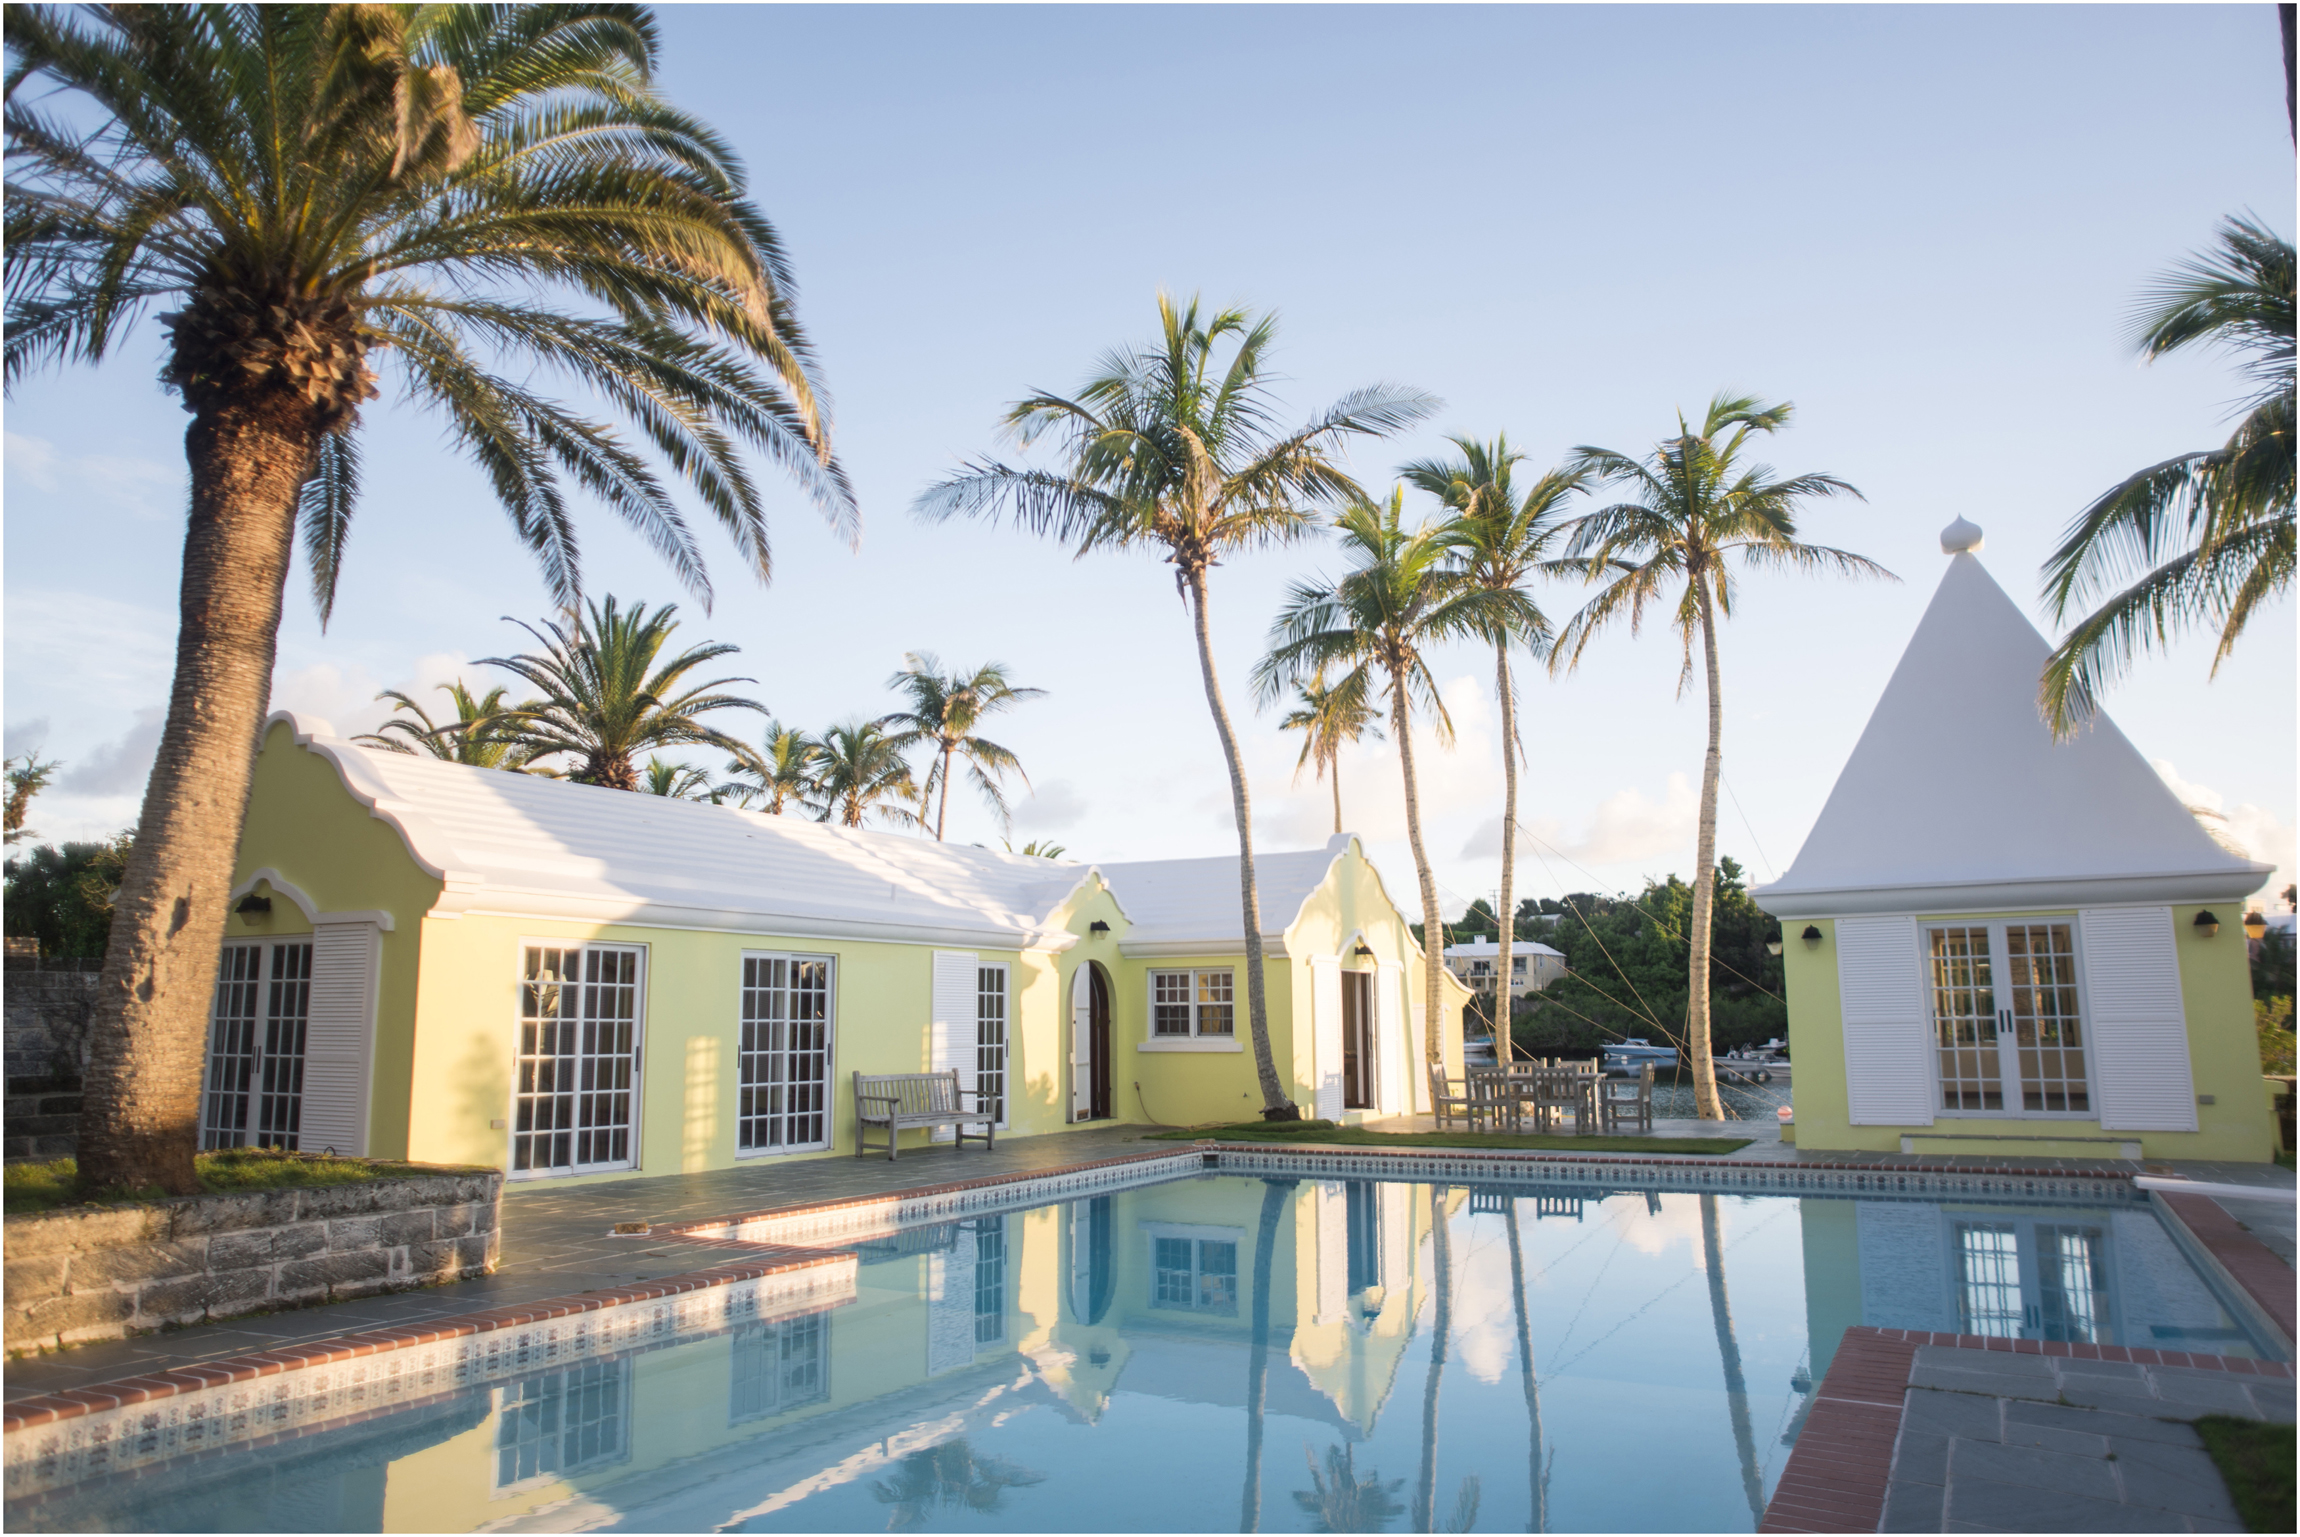 ©FianderFoto_Architecture_Bermuda_Palomera_023.jpg